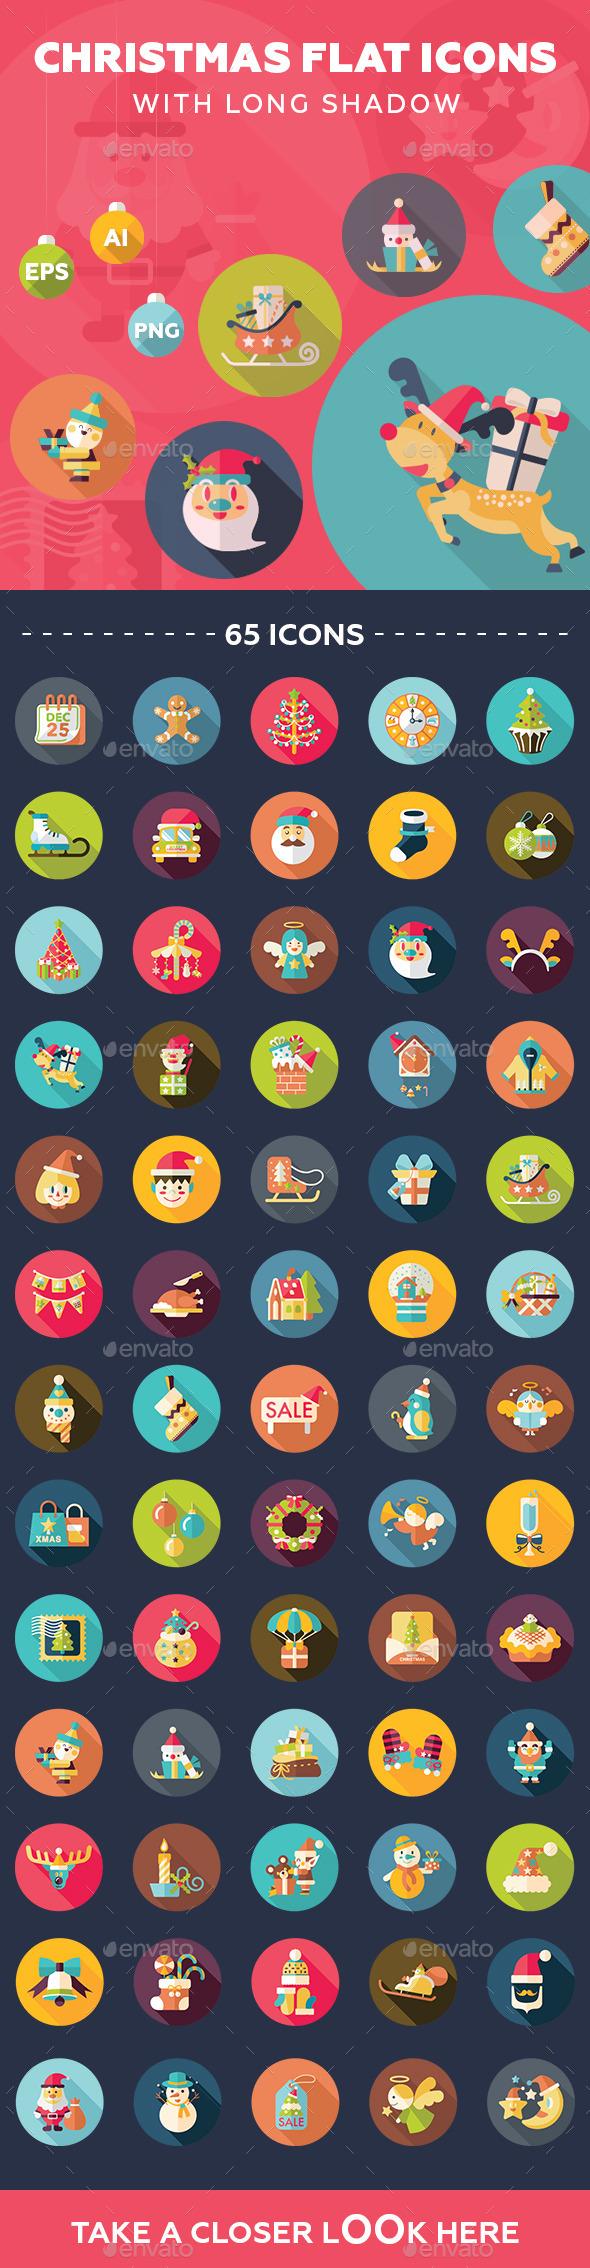 GraphicRiver 65 Christmas Flat Icons 9406228